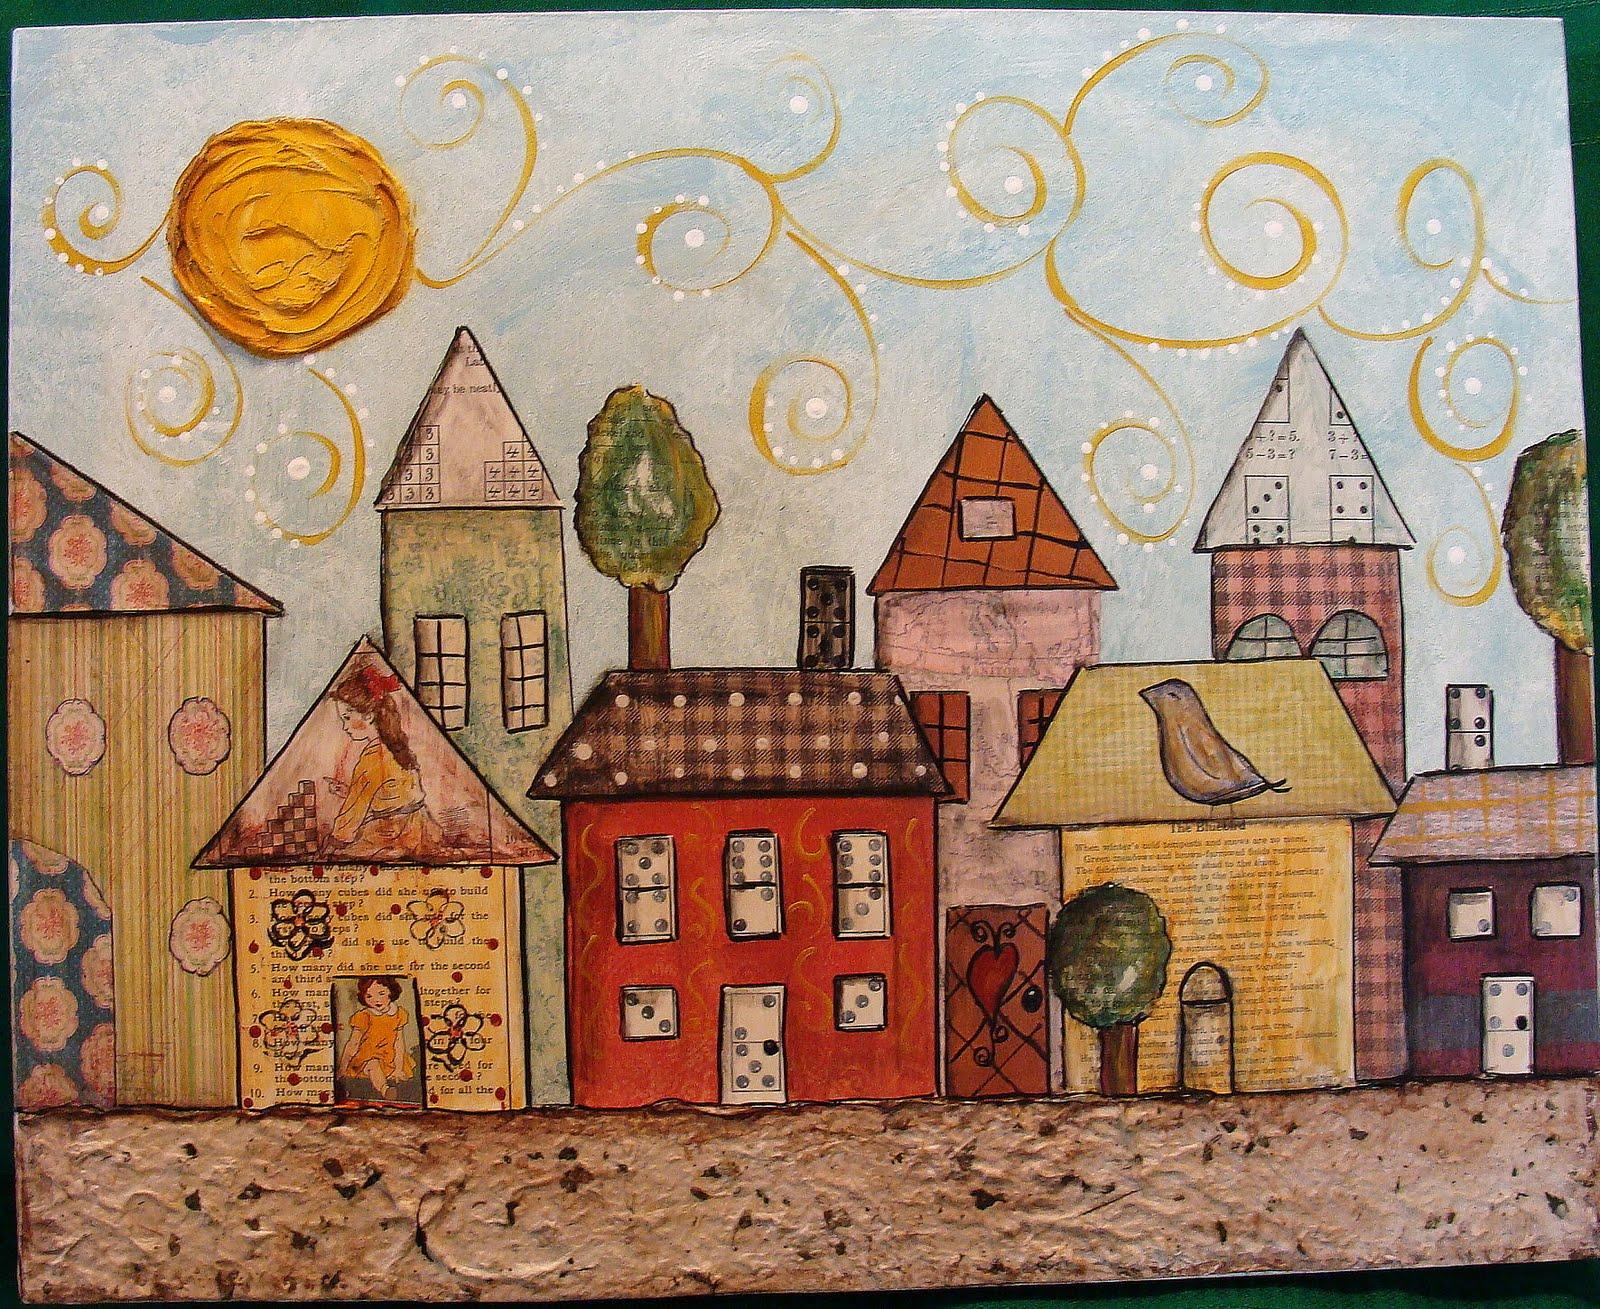 My Art Journal Mixed Media Paintings